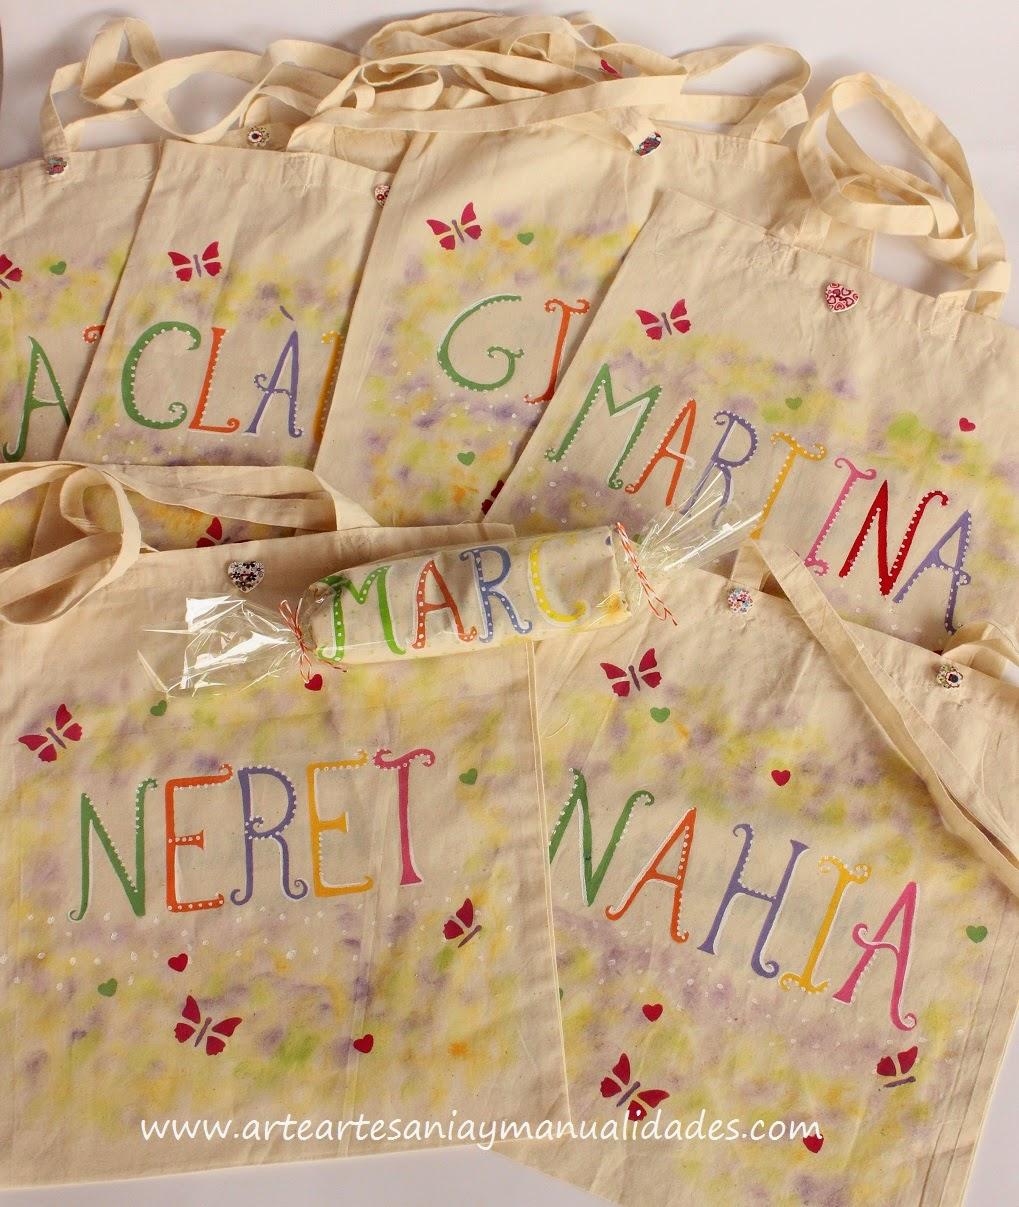 Arte artesania y manualidades bolsas de tela para ni os - Bolsas de tela para ninos ...